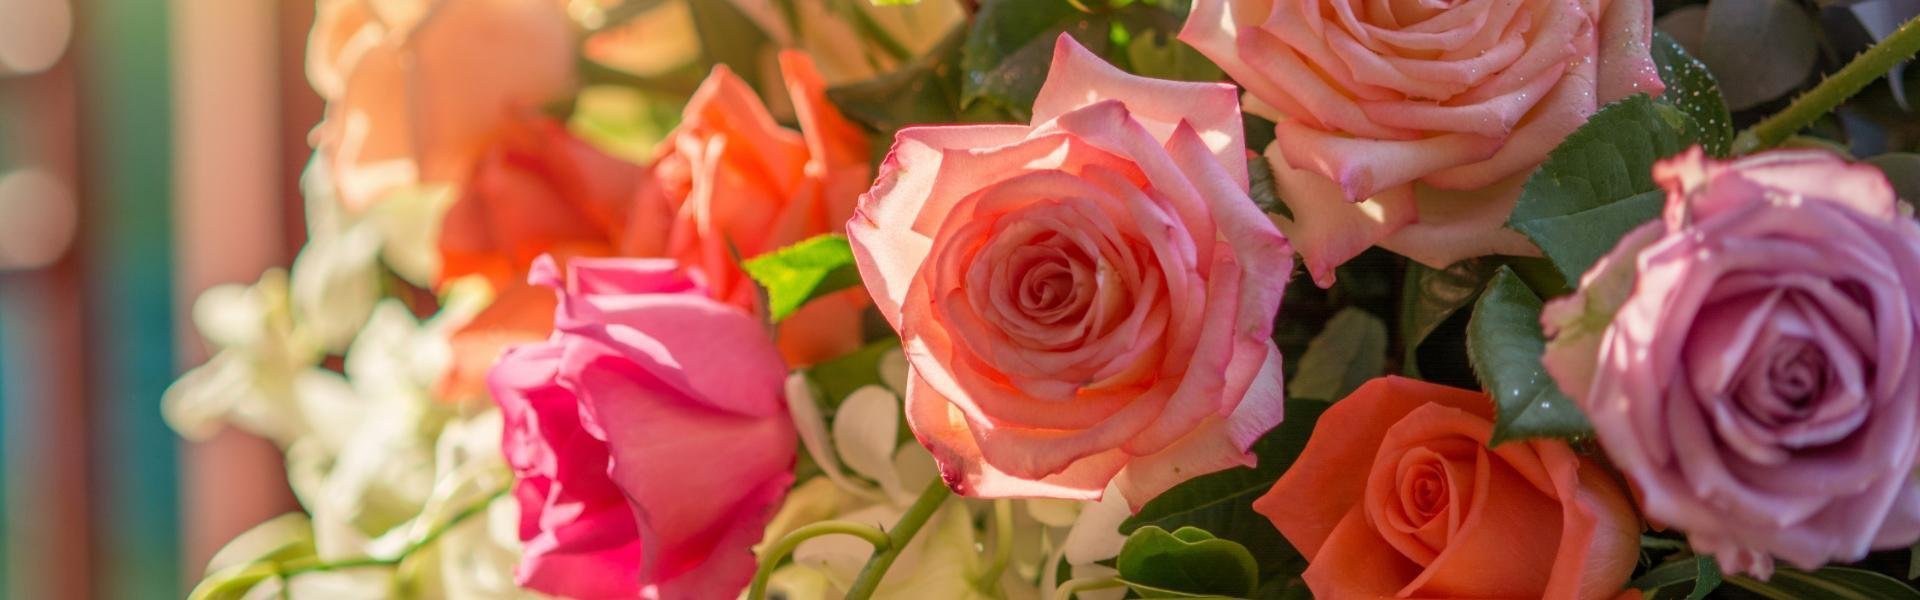 bukiet różnokolorowych róż